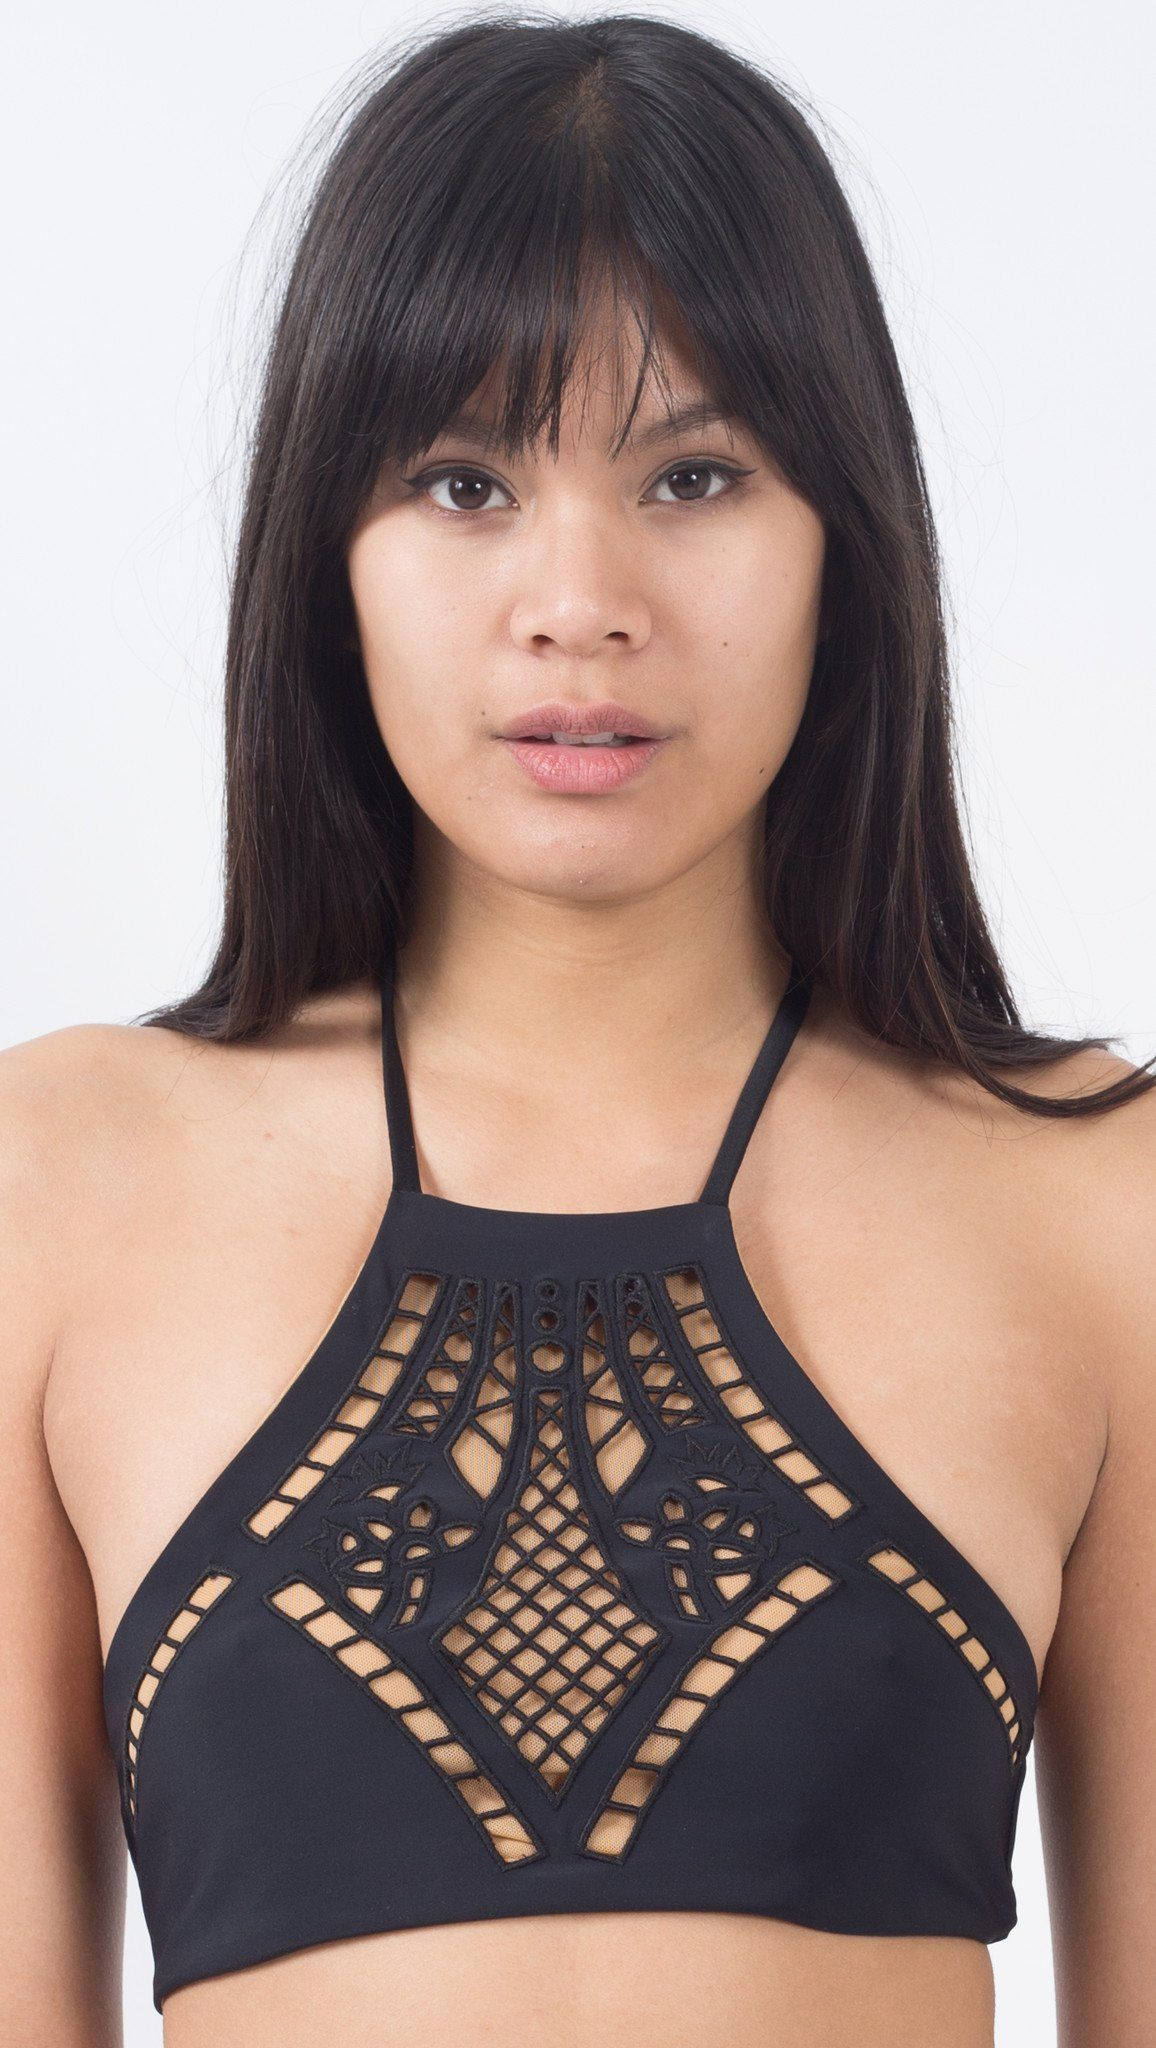 Onyx Top - Black